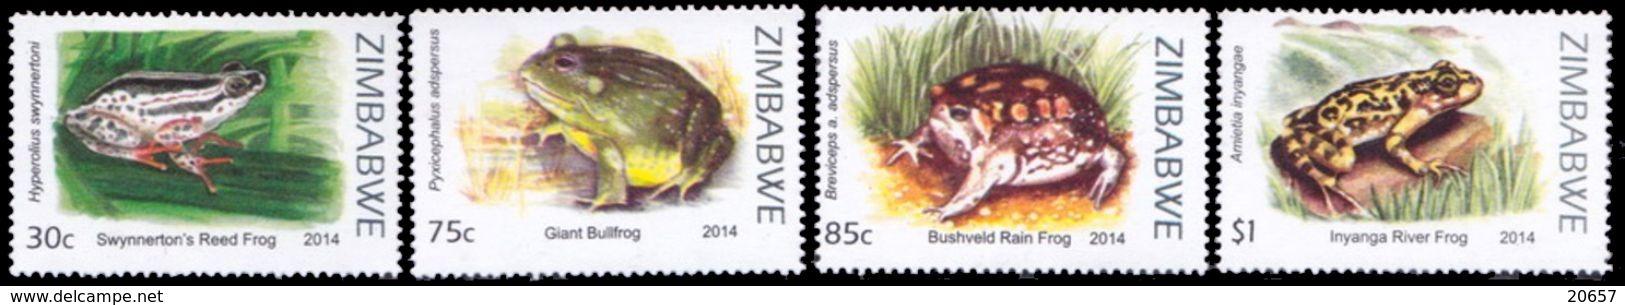 Zimbabwe 0762/65 Grenouilles - Frösche